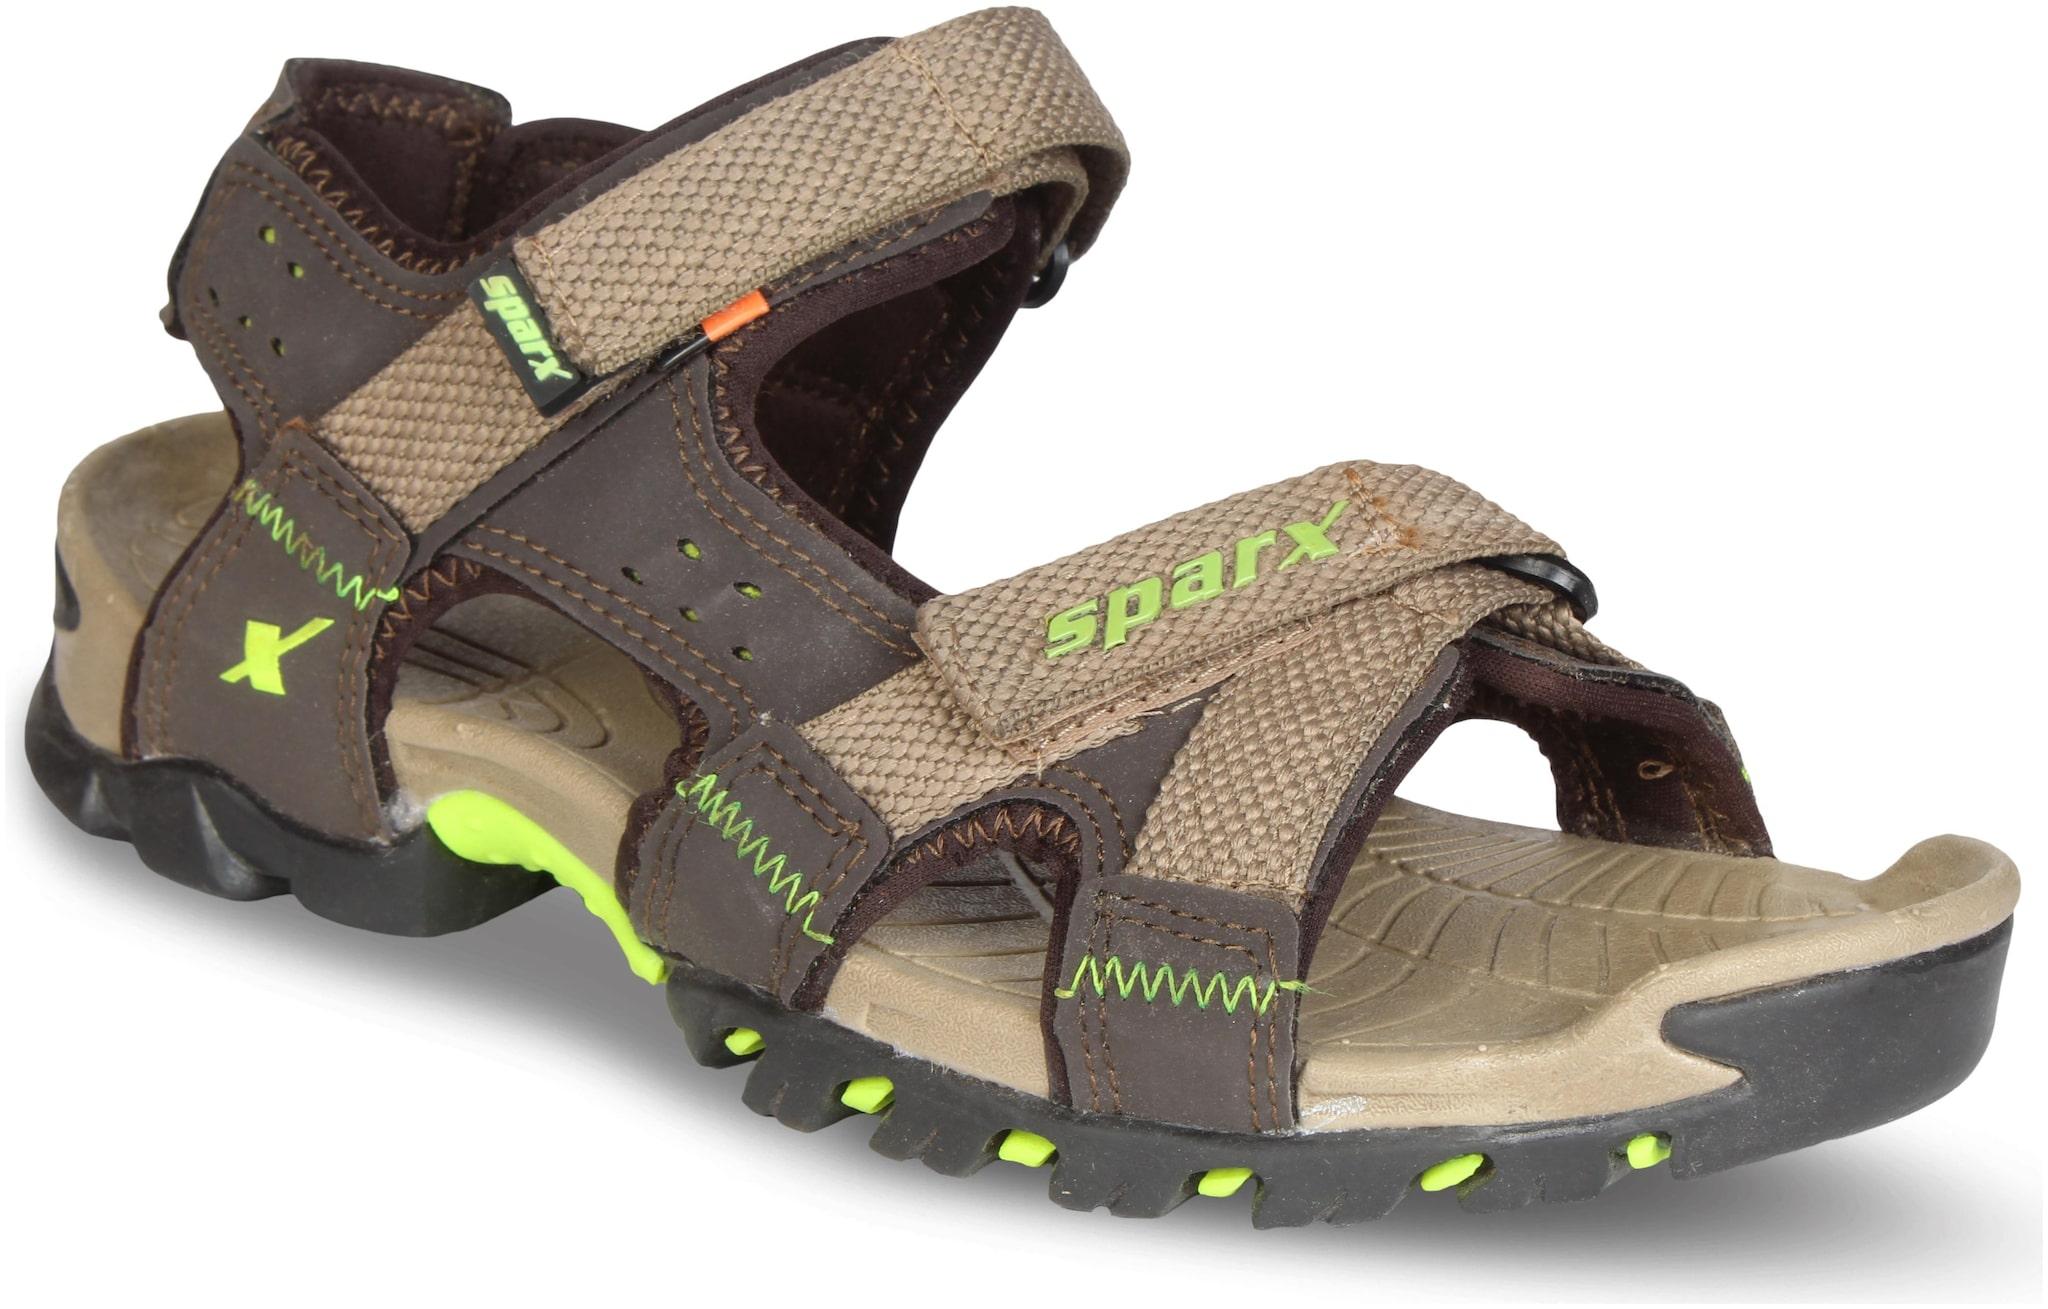 94c0b9dcdf Men's Sandals & Floaters - Buy Gents Sandals & Floaters Online at ...